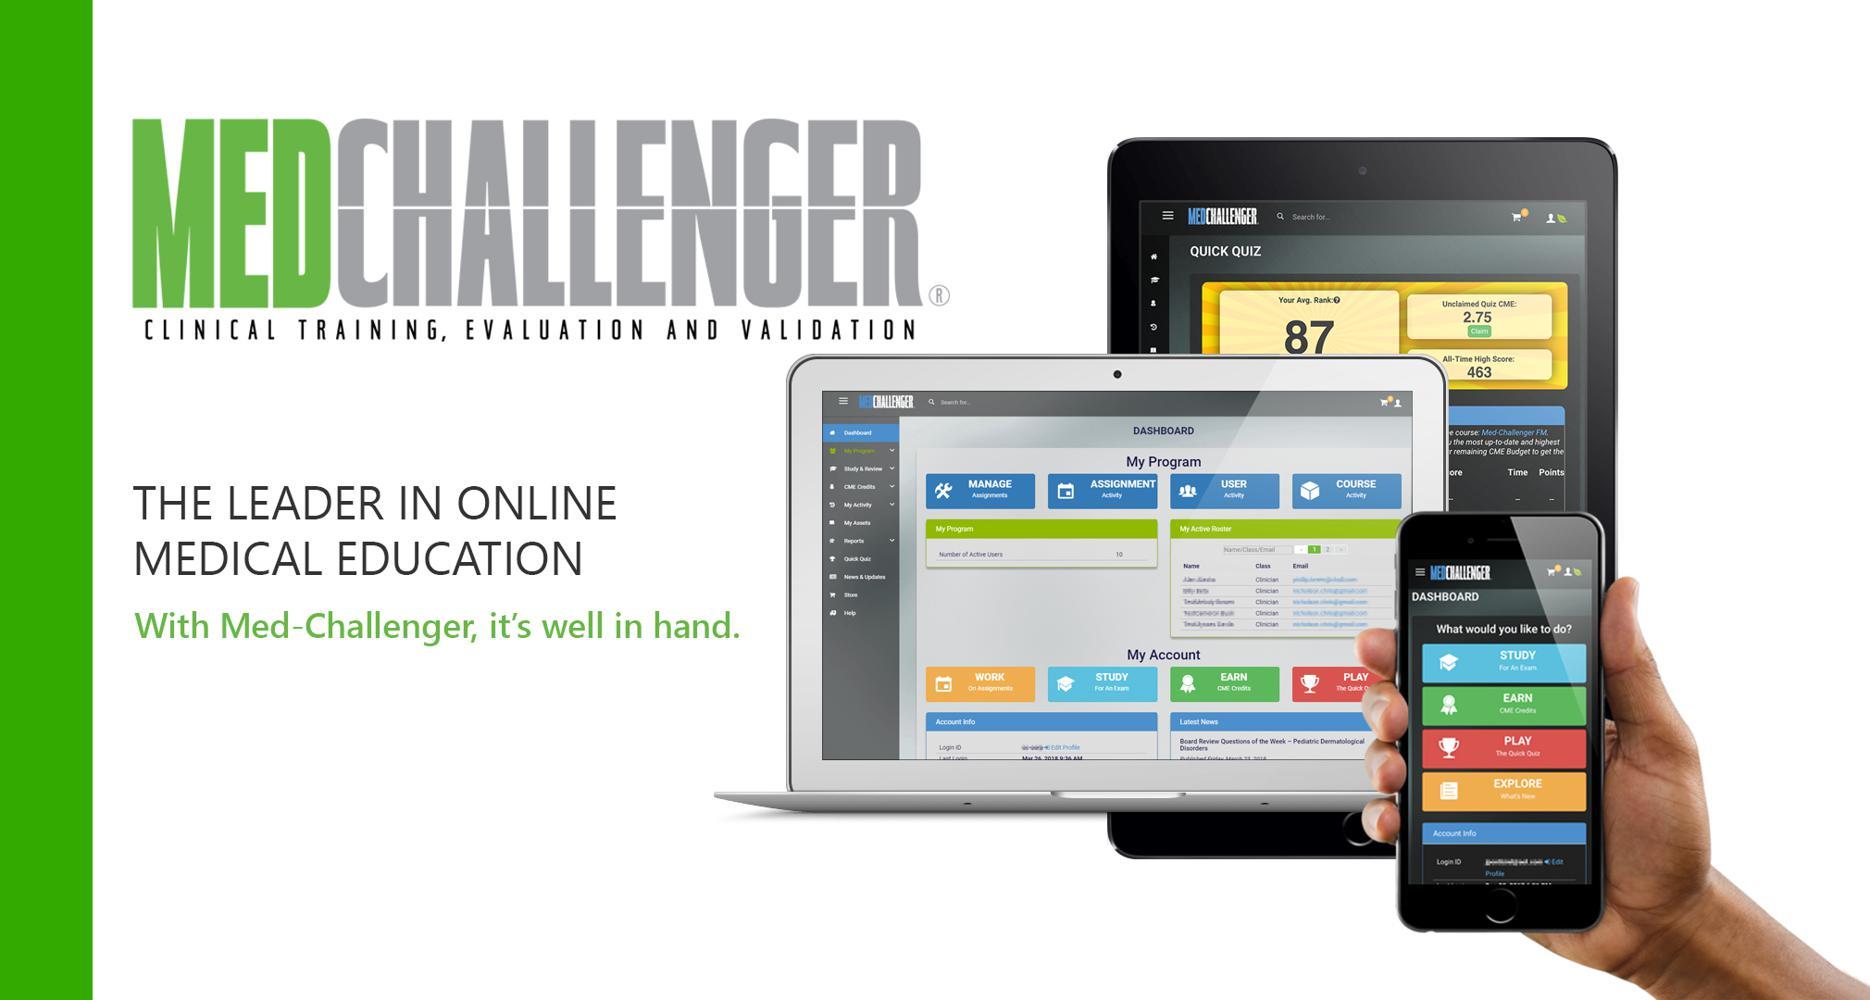 Med-Challenger